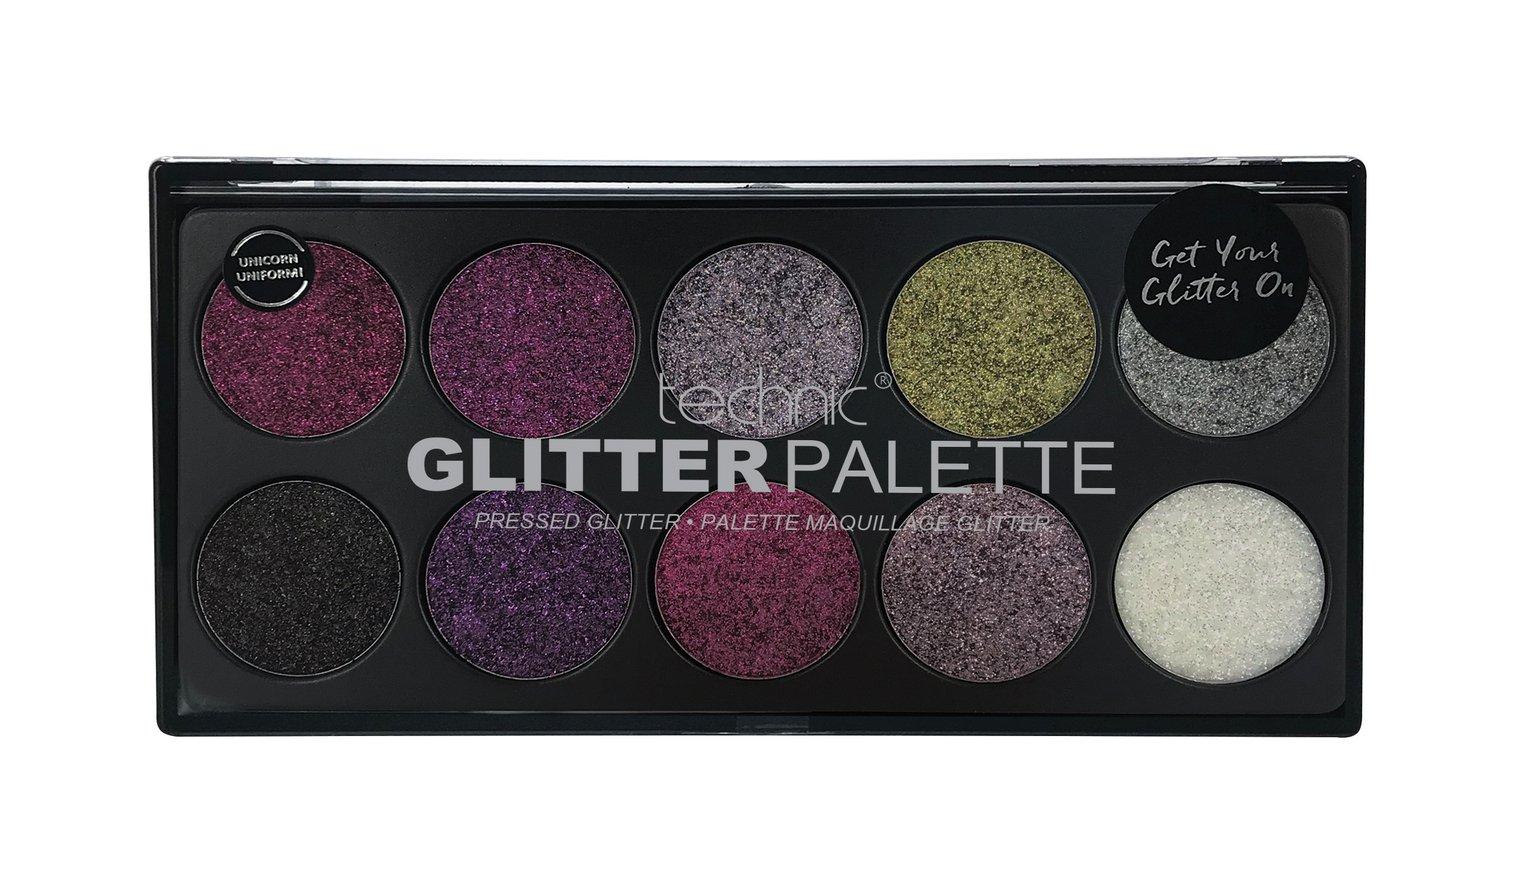 Technic Unicorn Glitter Palette